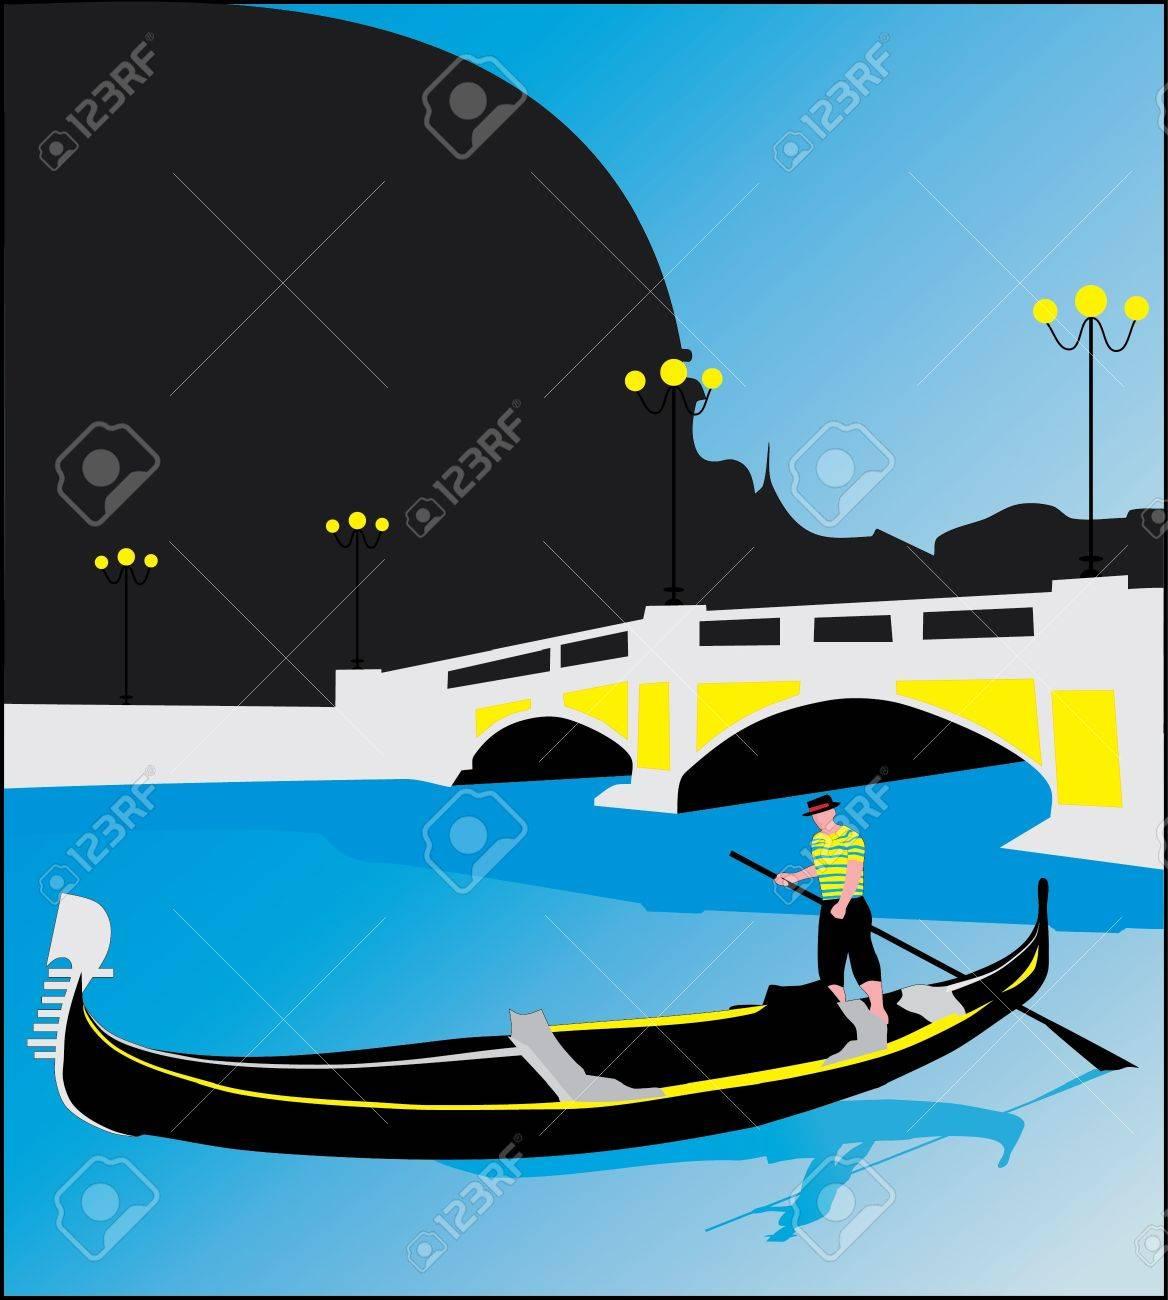 Gondolas in Venice Stock Vector - 13559085